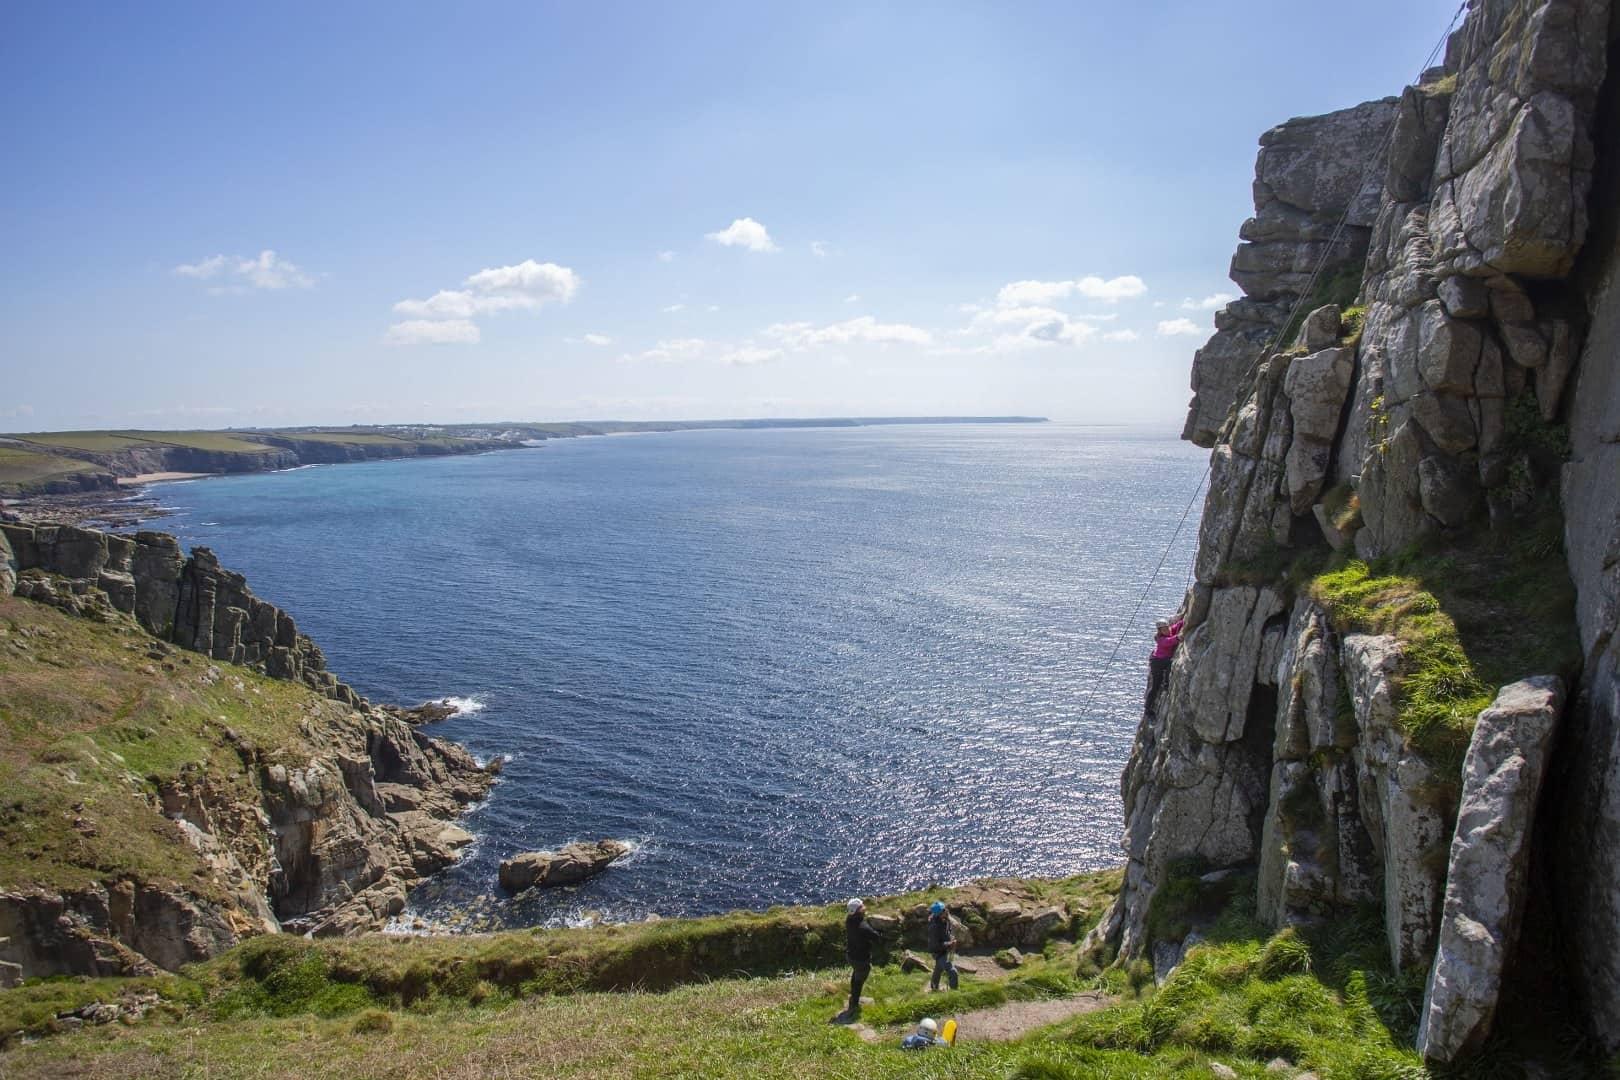 Beginner rock climbing at Trewavas Head, near Praa Sands Cornwall